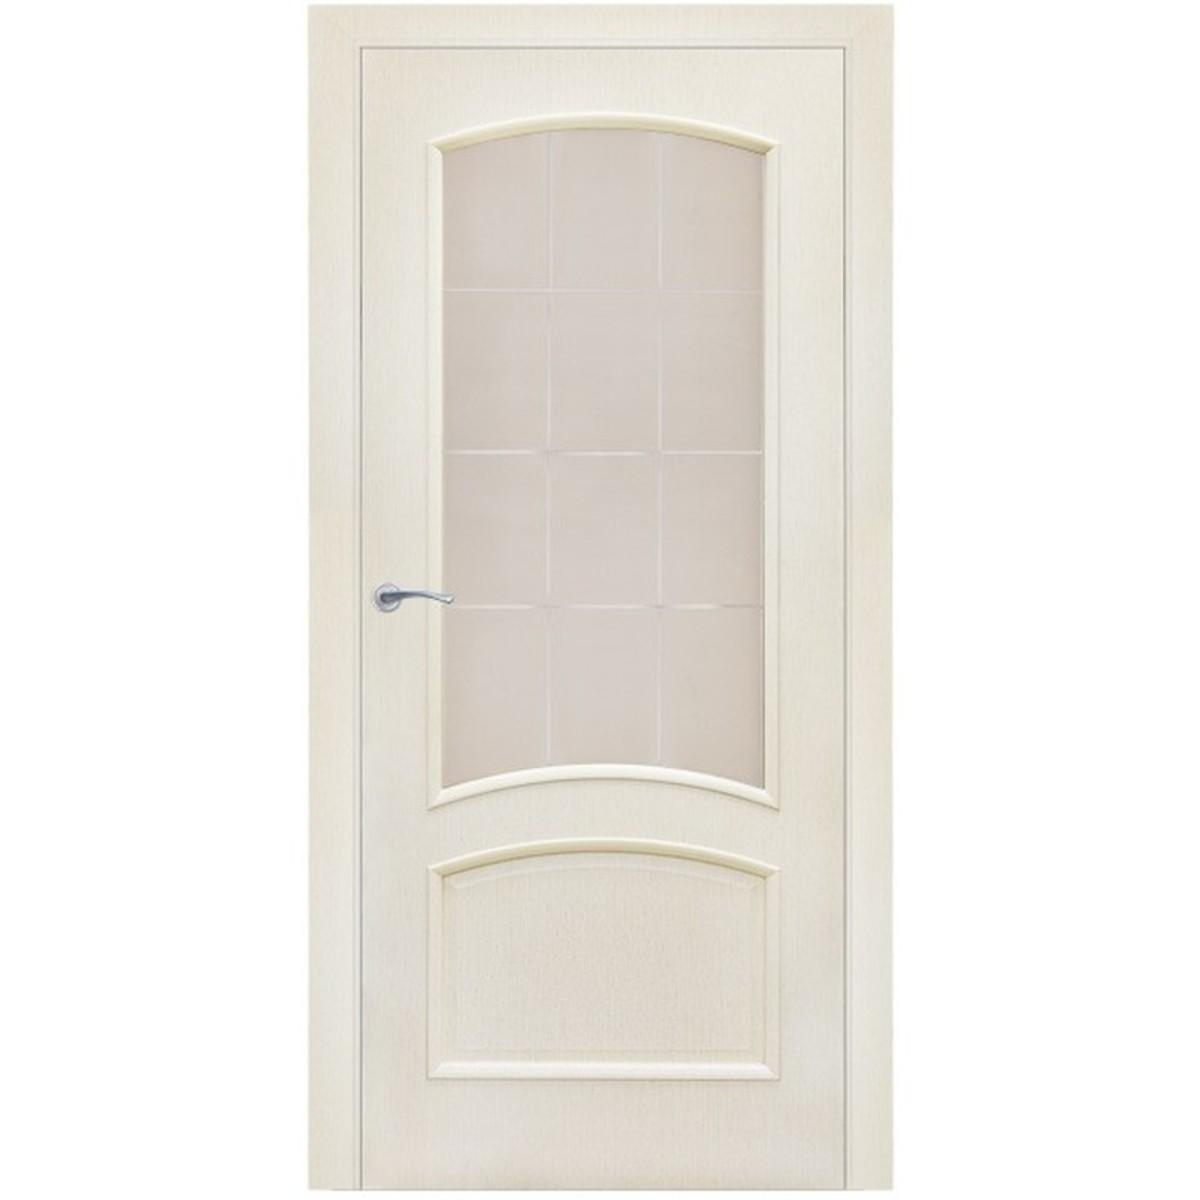 Дверь Межкомнатная Остеклённая Bravo 80x200 Ламинация Цвет Меланж